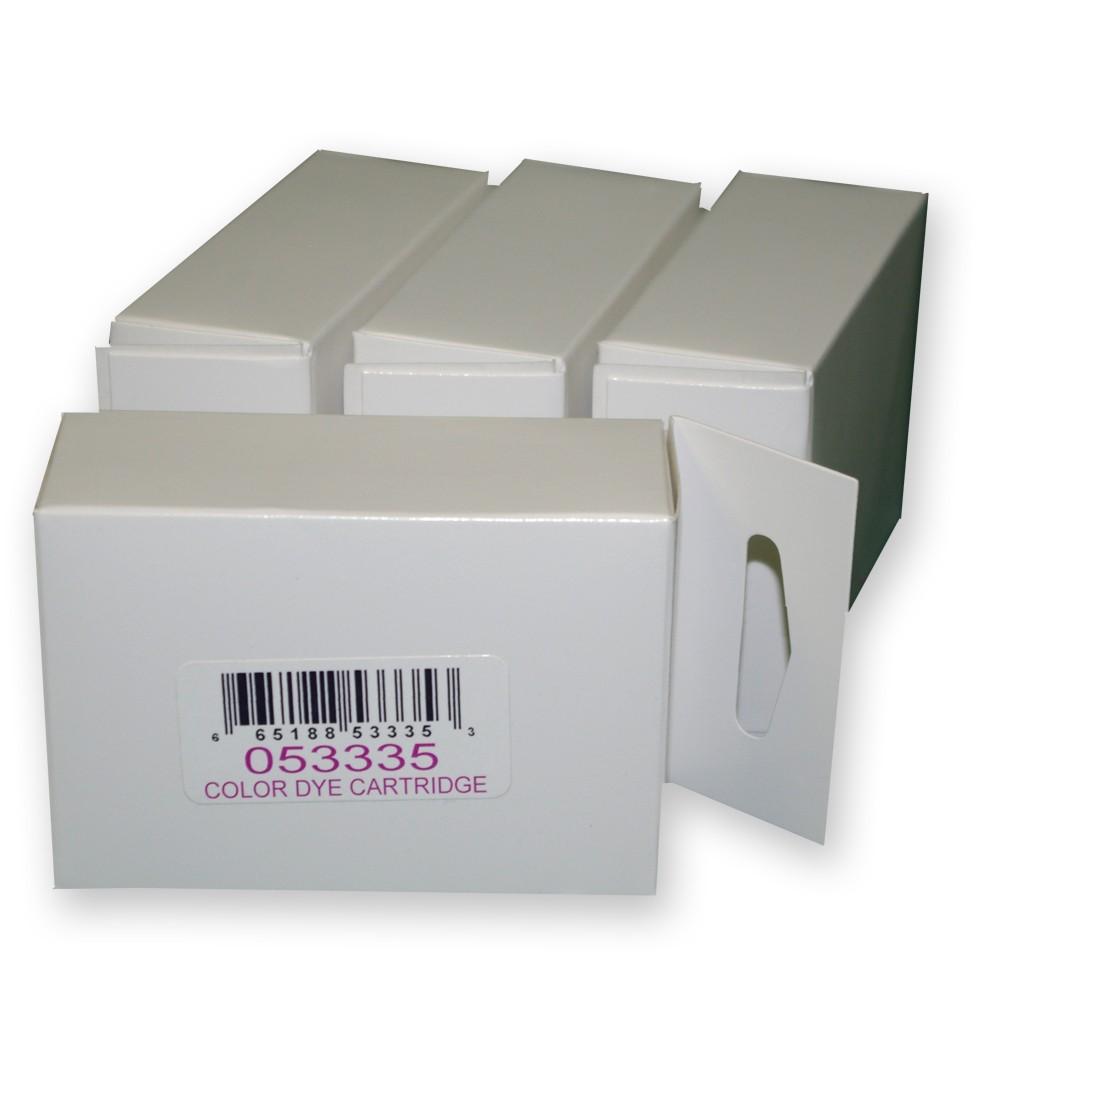 Codonics 1VCX-LR833